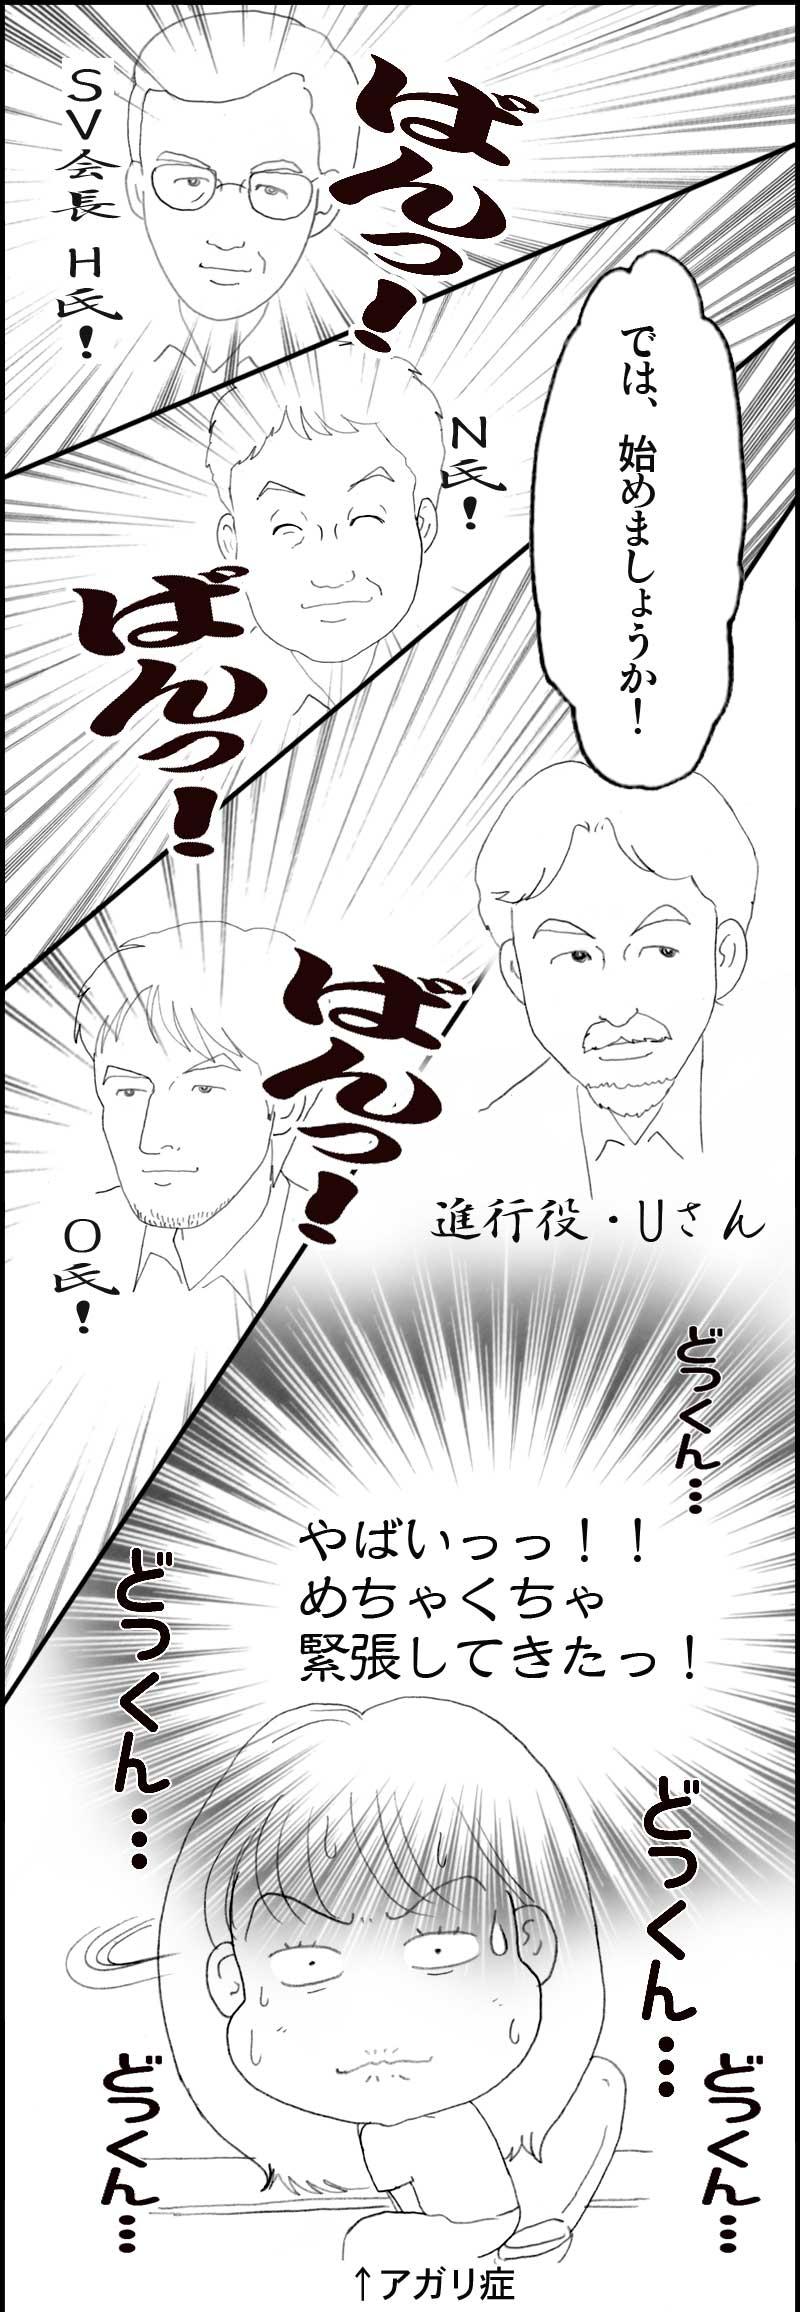 BOSCH漫画〜第2部 漫画対談っ!!〜_f0119369_15282743.jpg